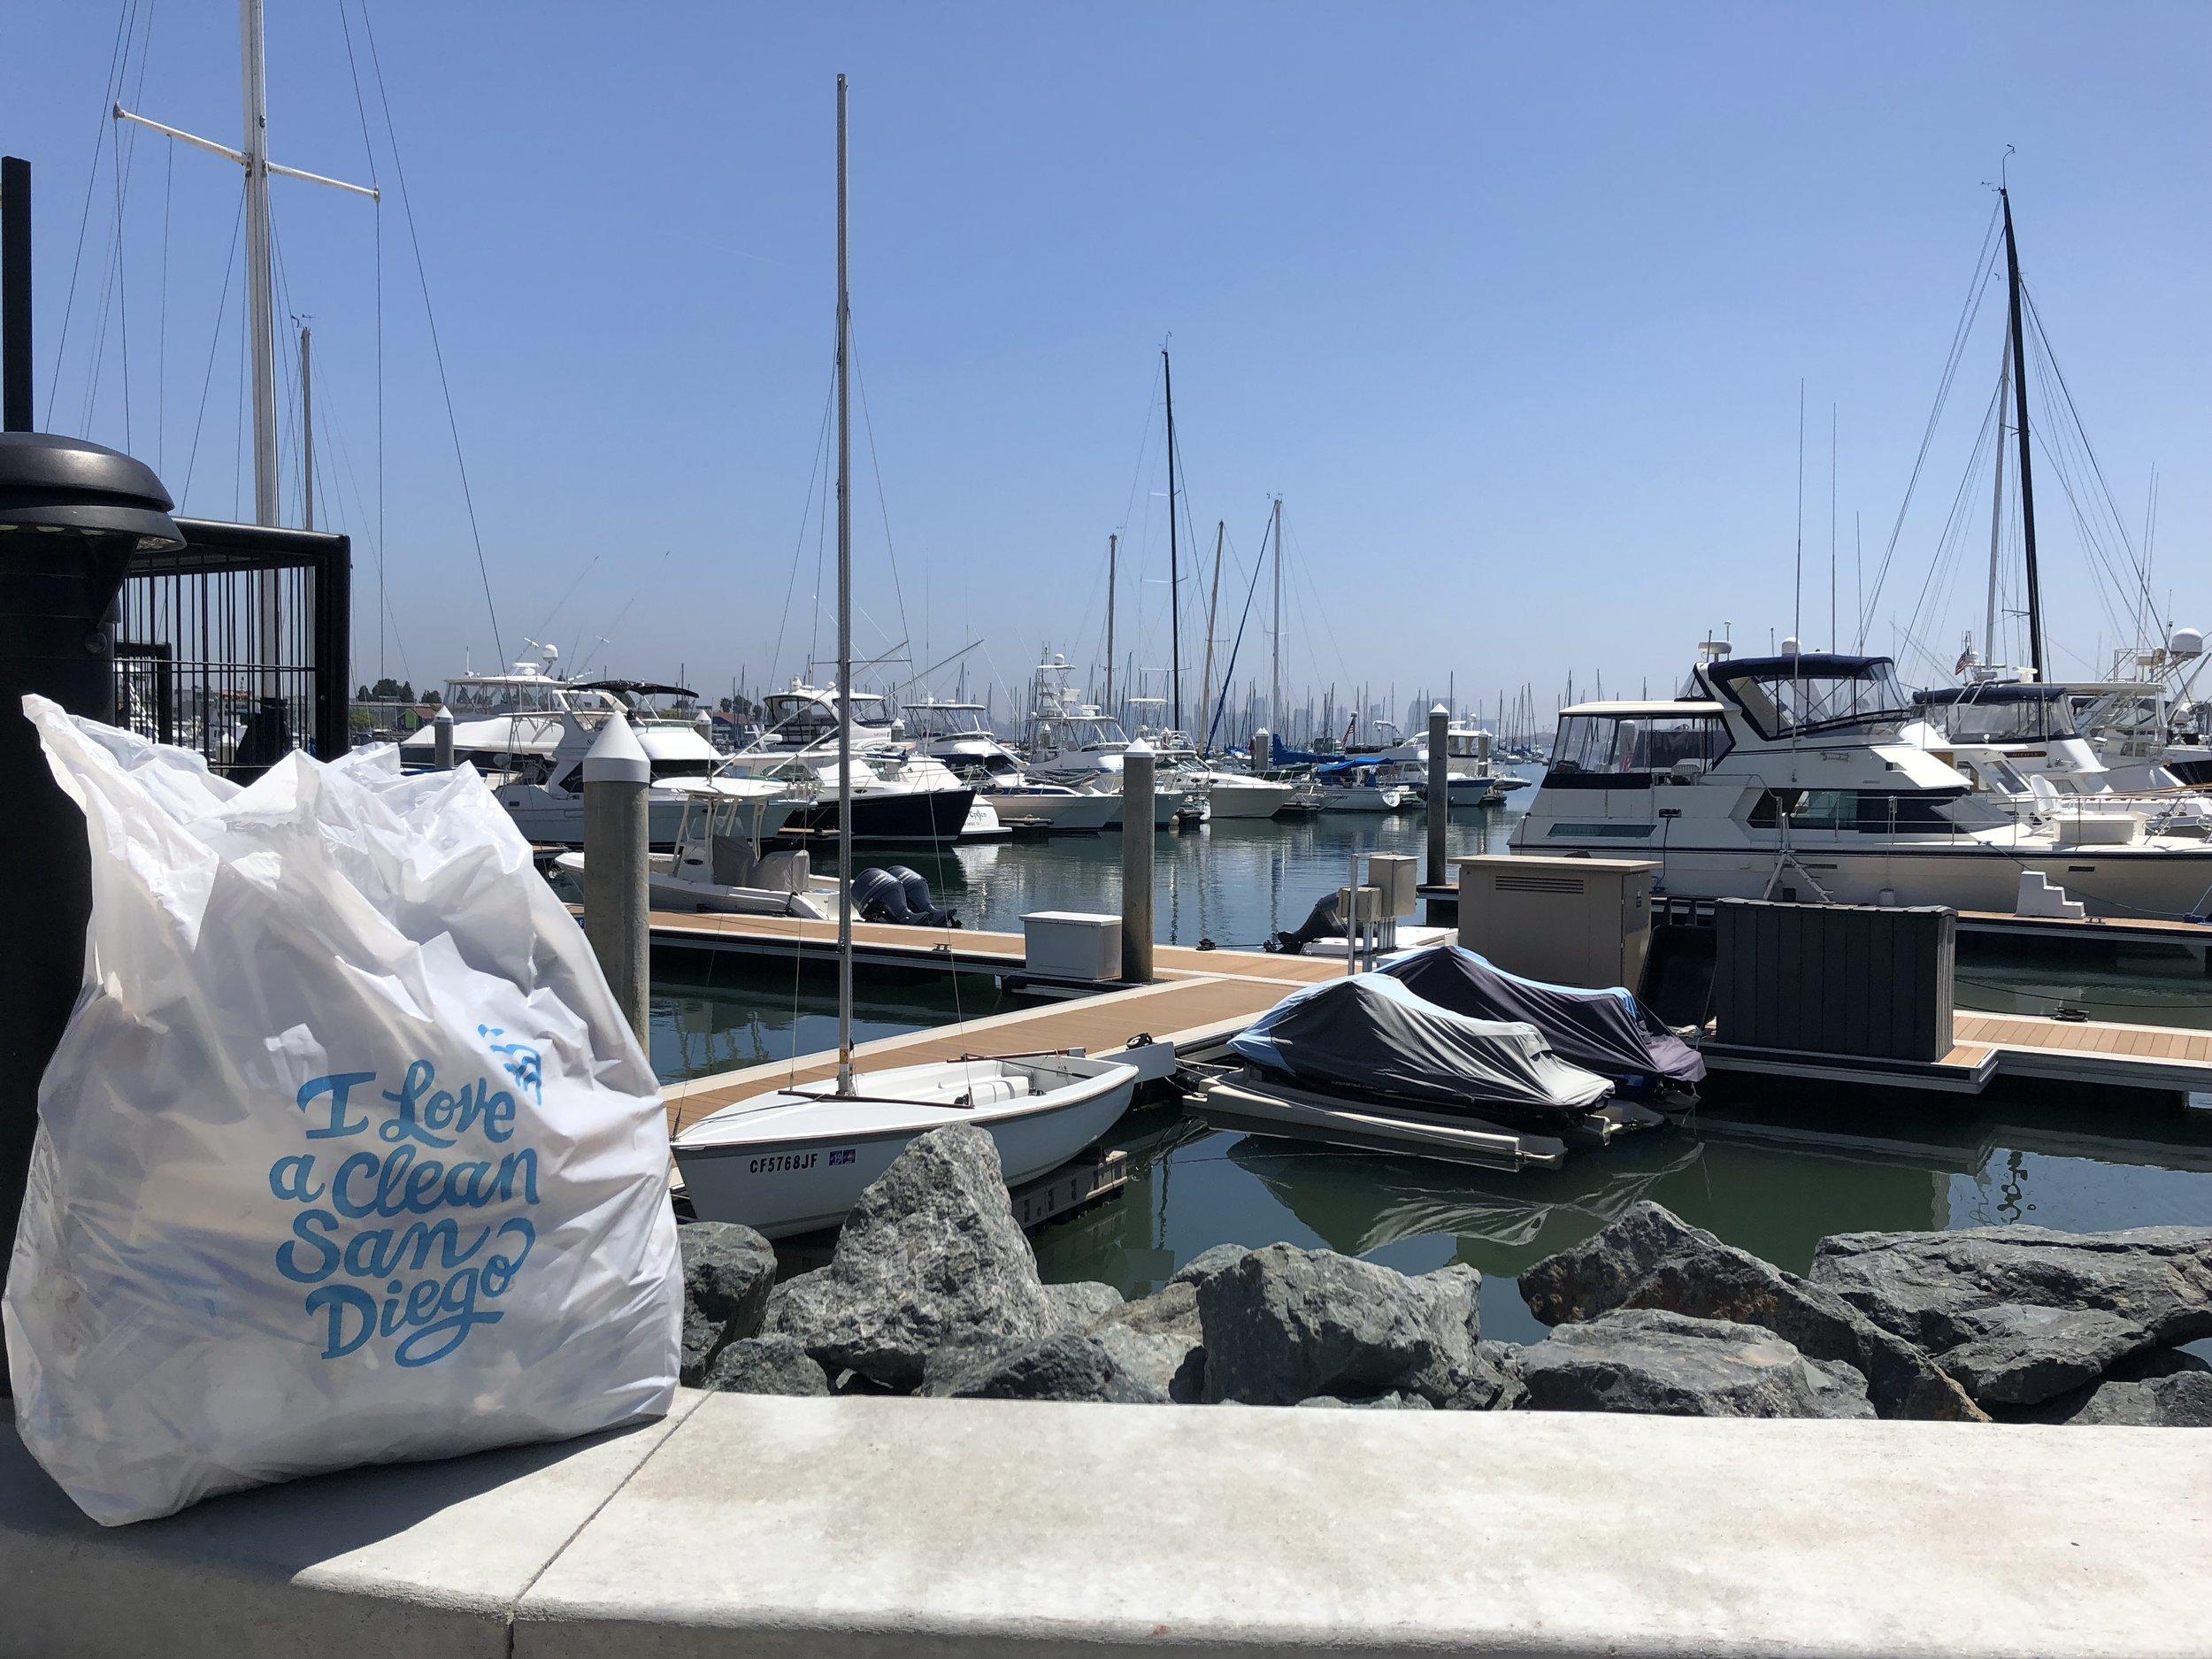 point-loman-trash-cleanup-bag-1-i-love-a-clean-san-diego-april-24-2019.jpg